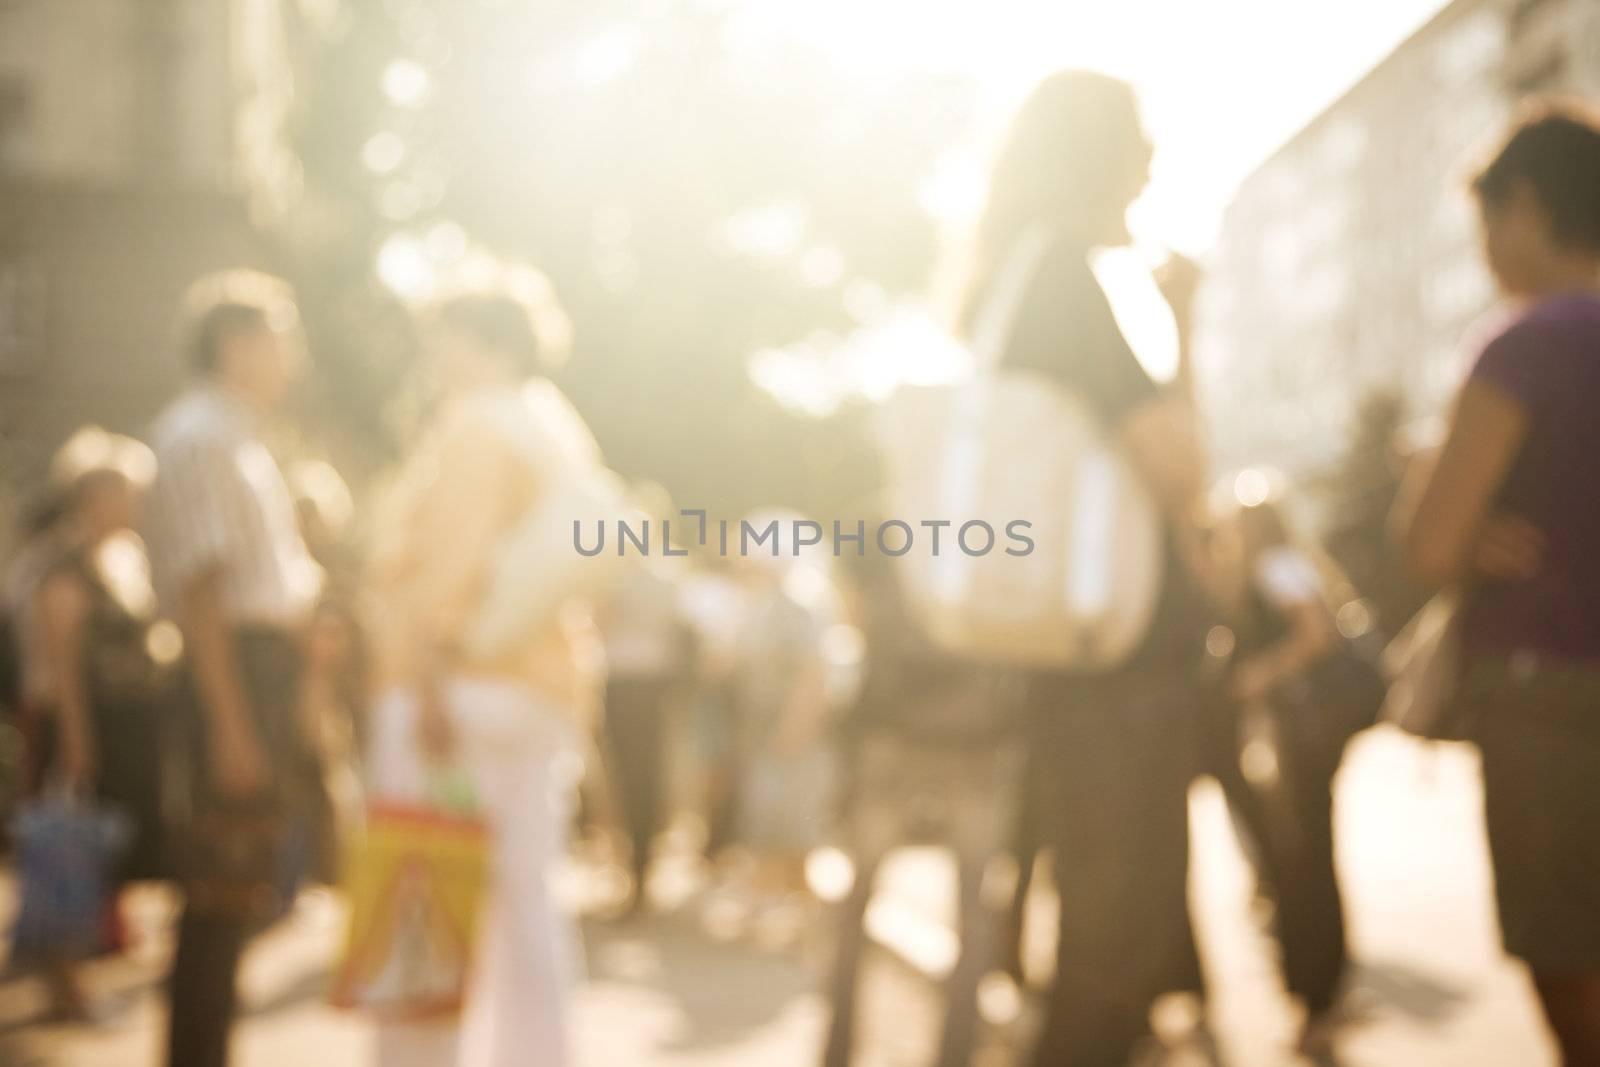 special lens blur f/x, toned urban citizen concept